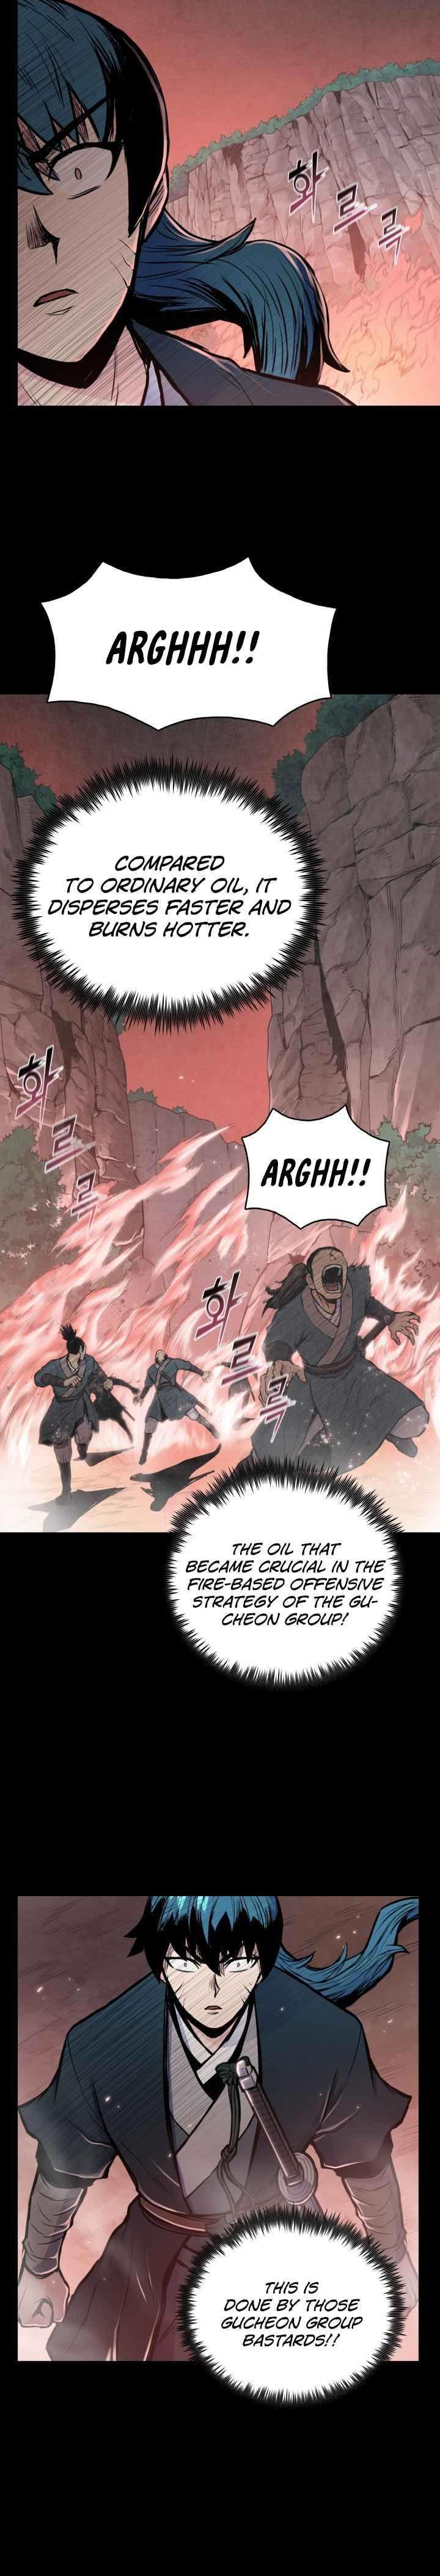 Reincarnated War God Chapter 46 page 15 - Mangakakalots.com